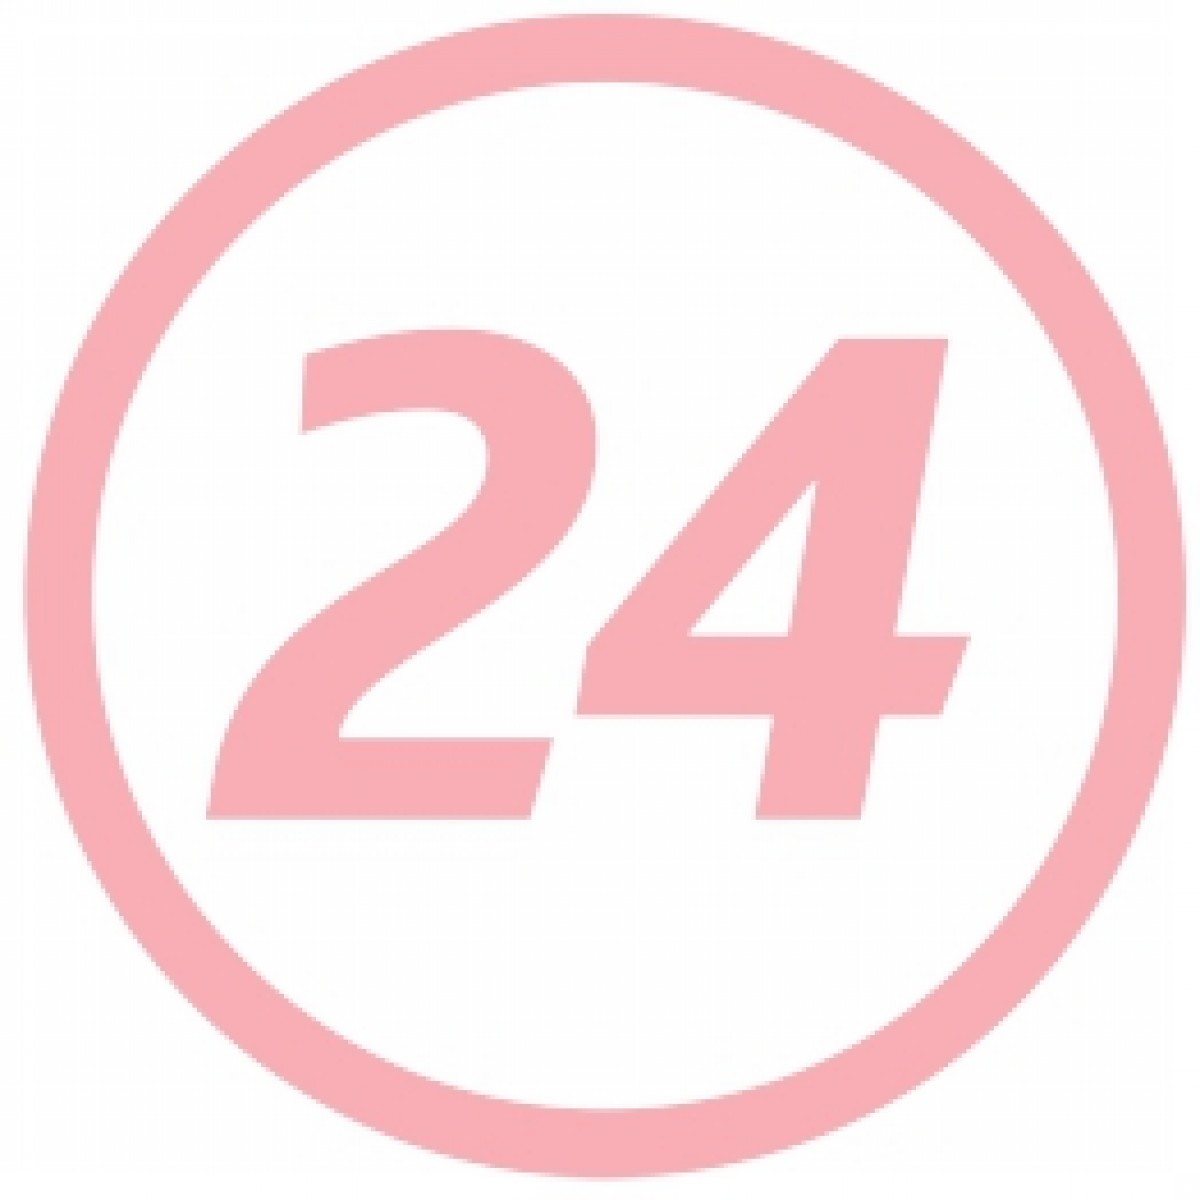 Hartmann Molicare Pad 3 Picaturi Tampoane pentru Incontinenta Usoara, Tampoane, 28buc